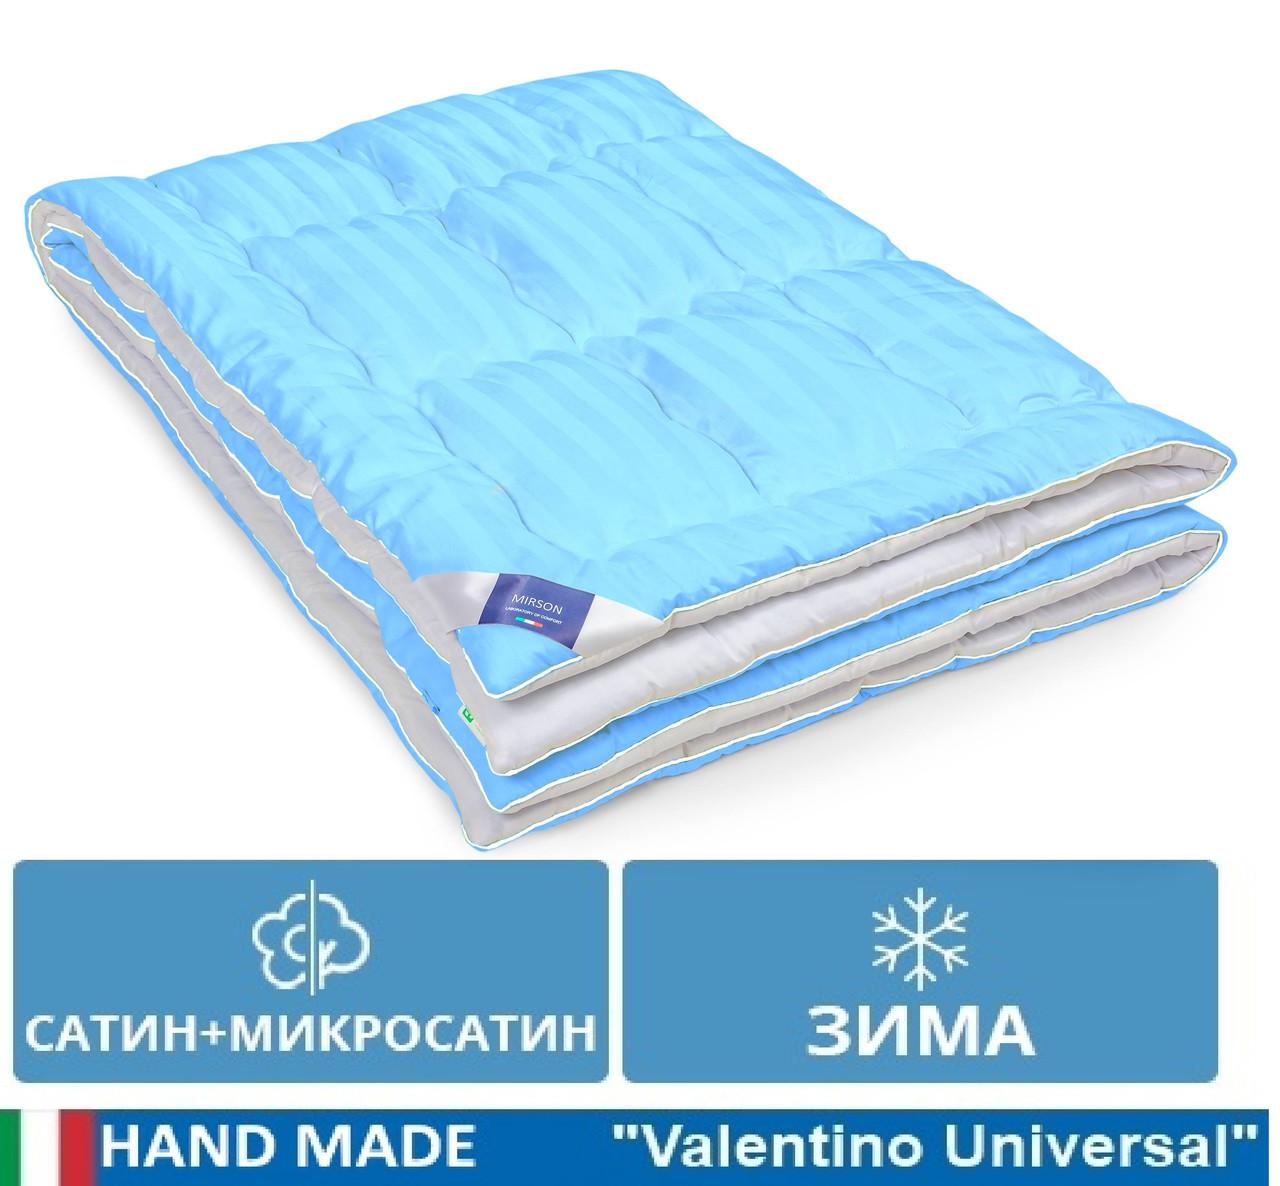 Одеяло полуторное Зимнее 155x215 Valentino HAND MADE EcoSilk 0554